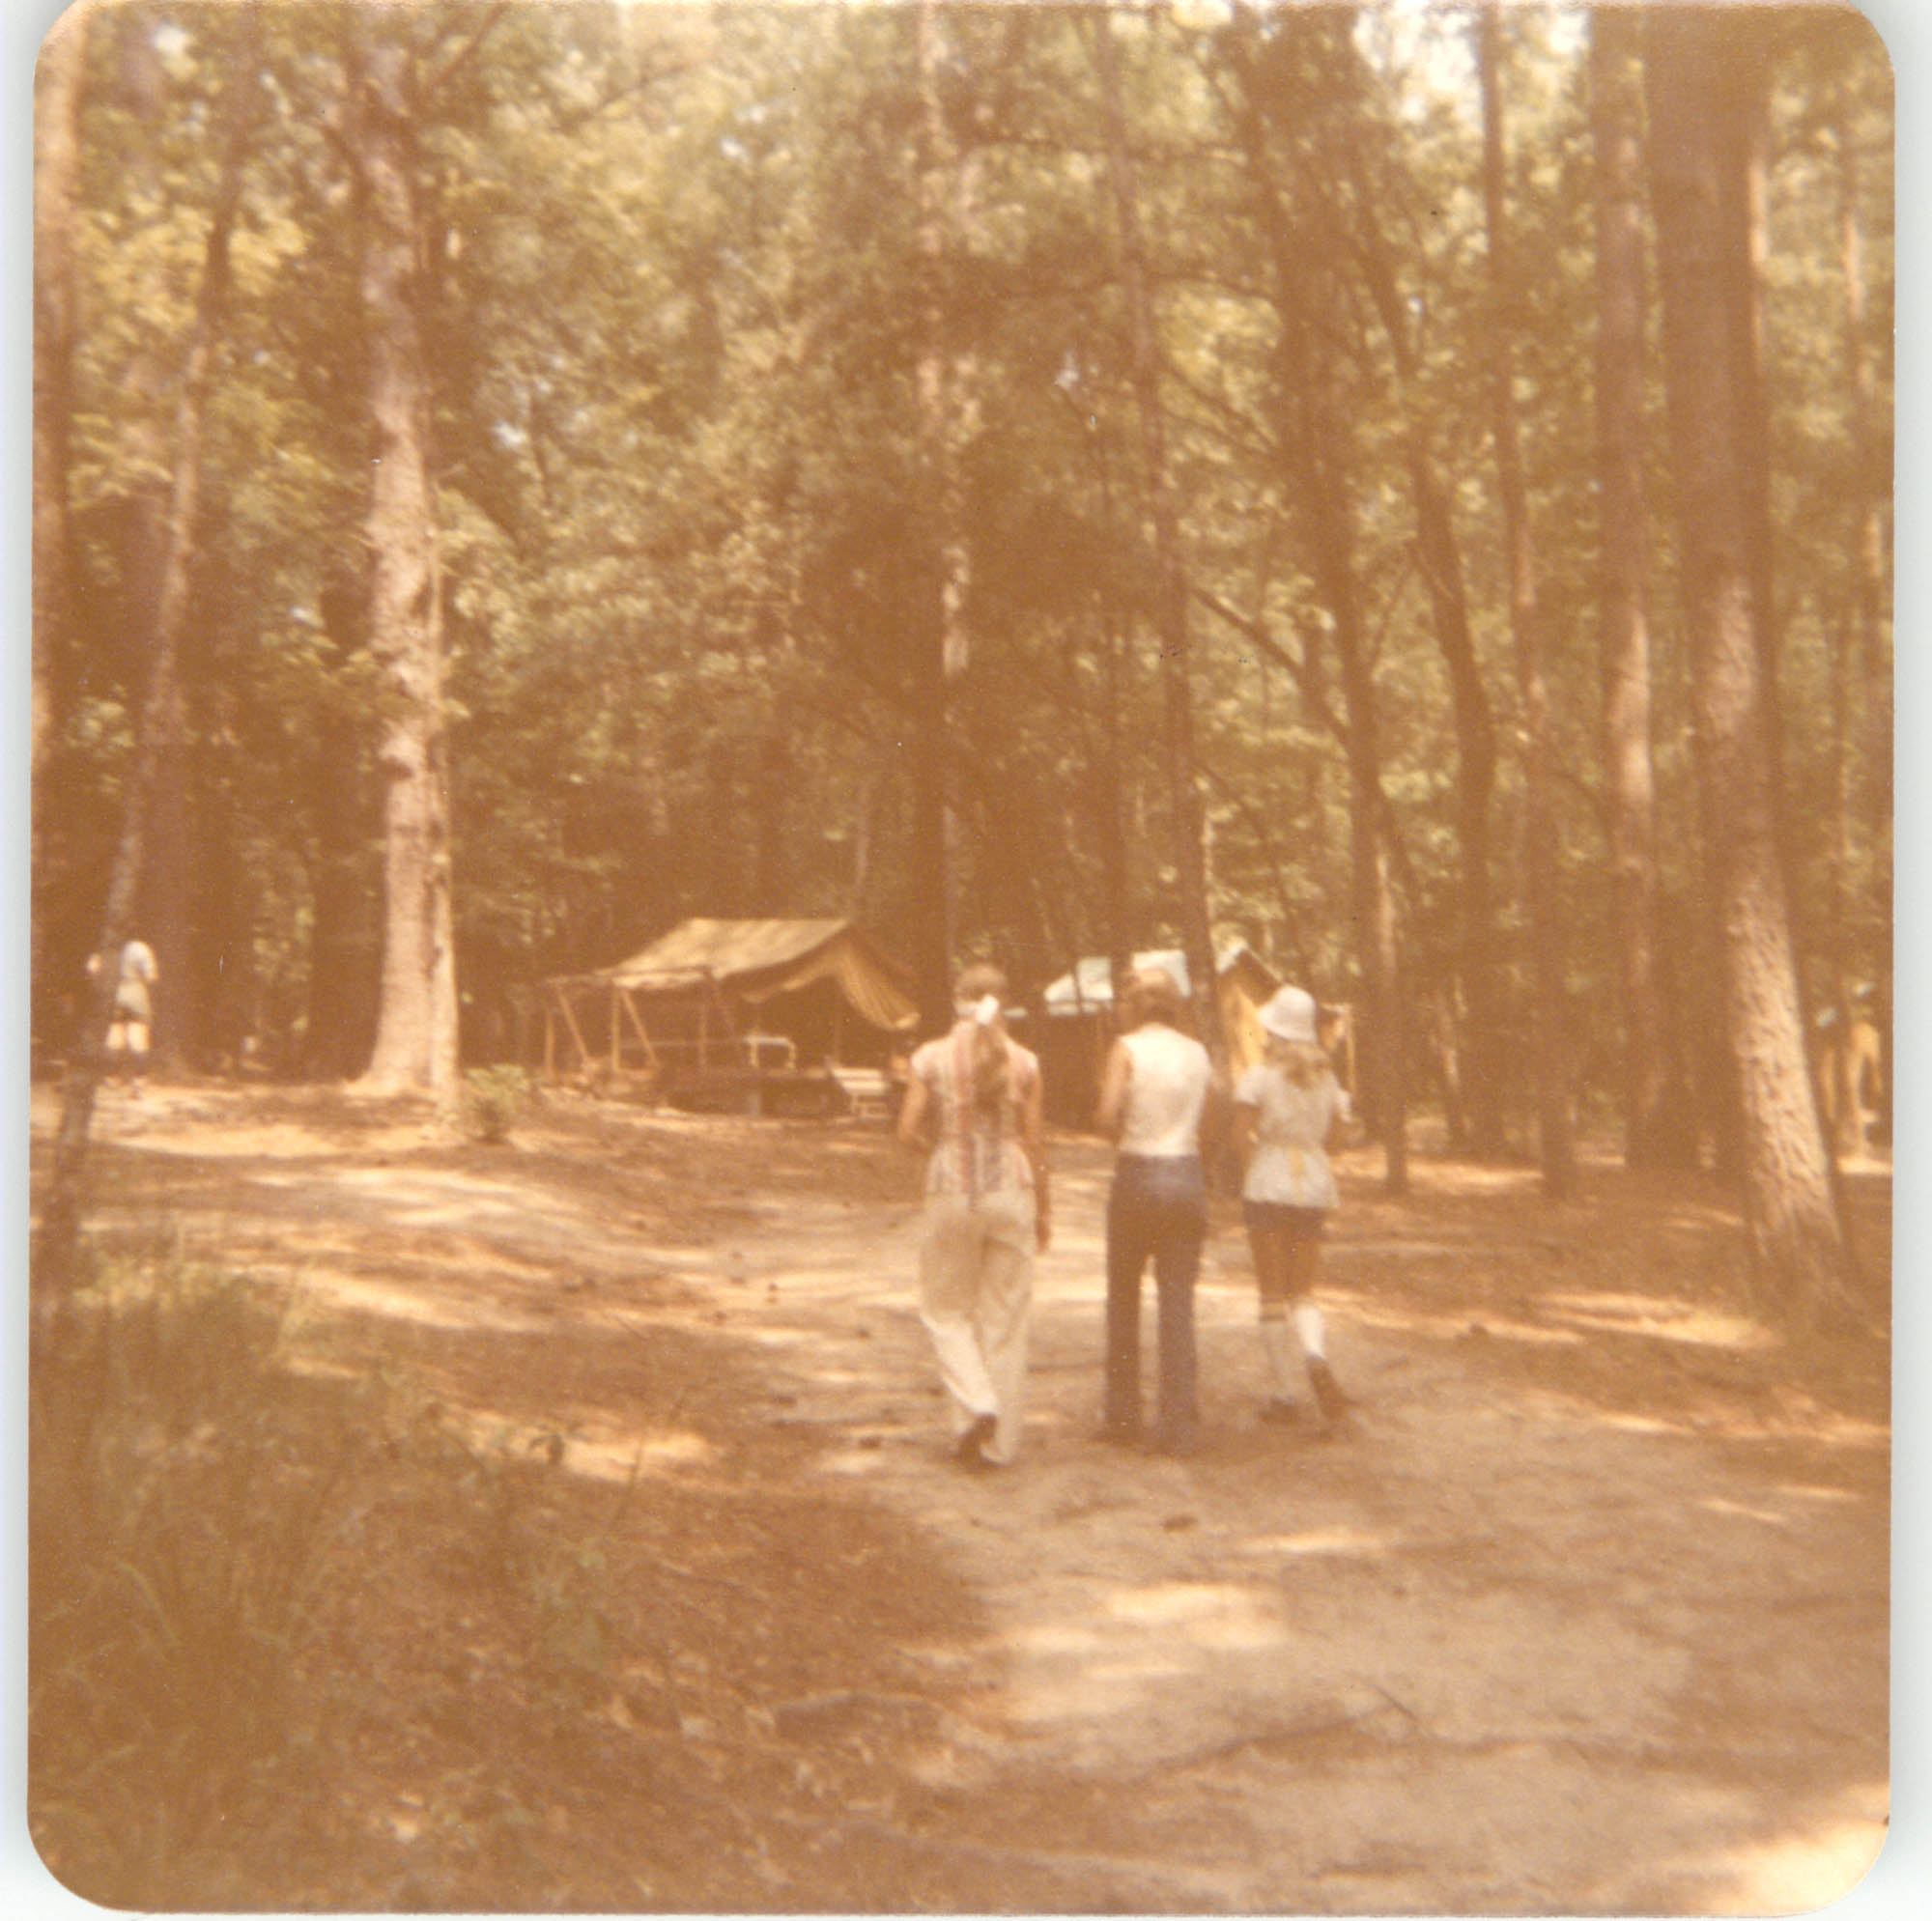 Photograph of Three People Walking